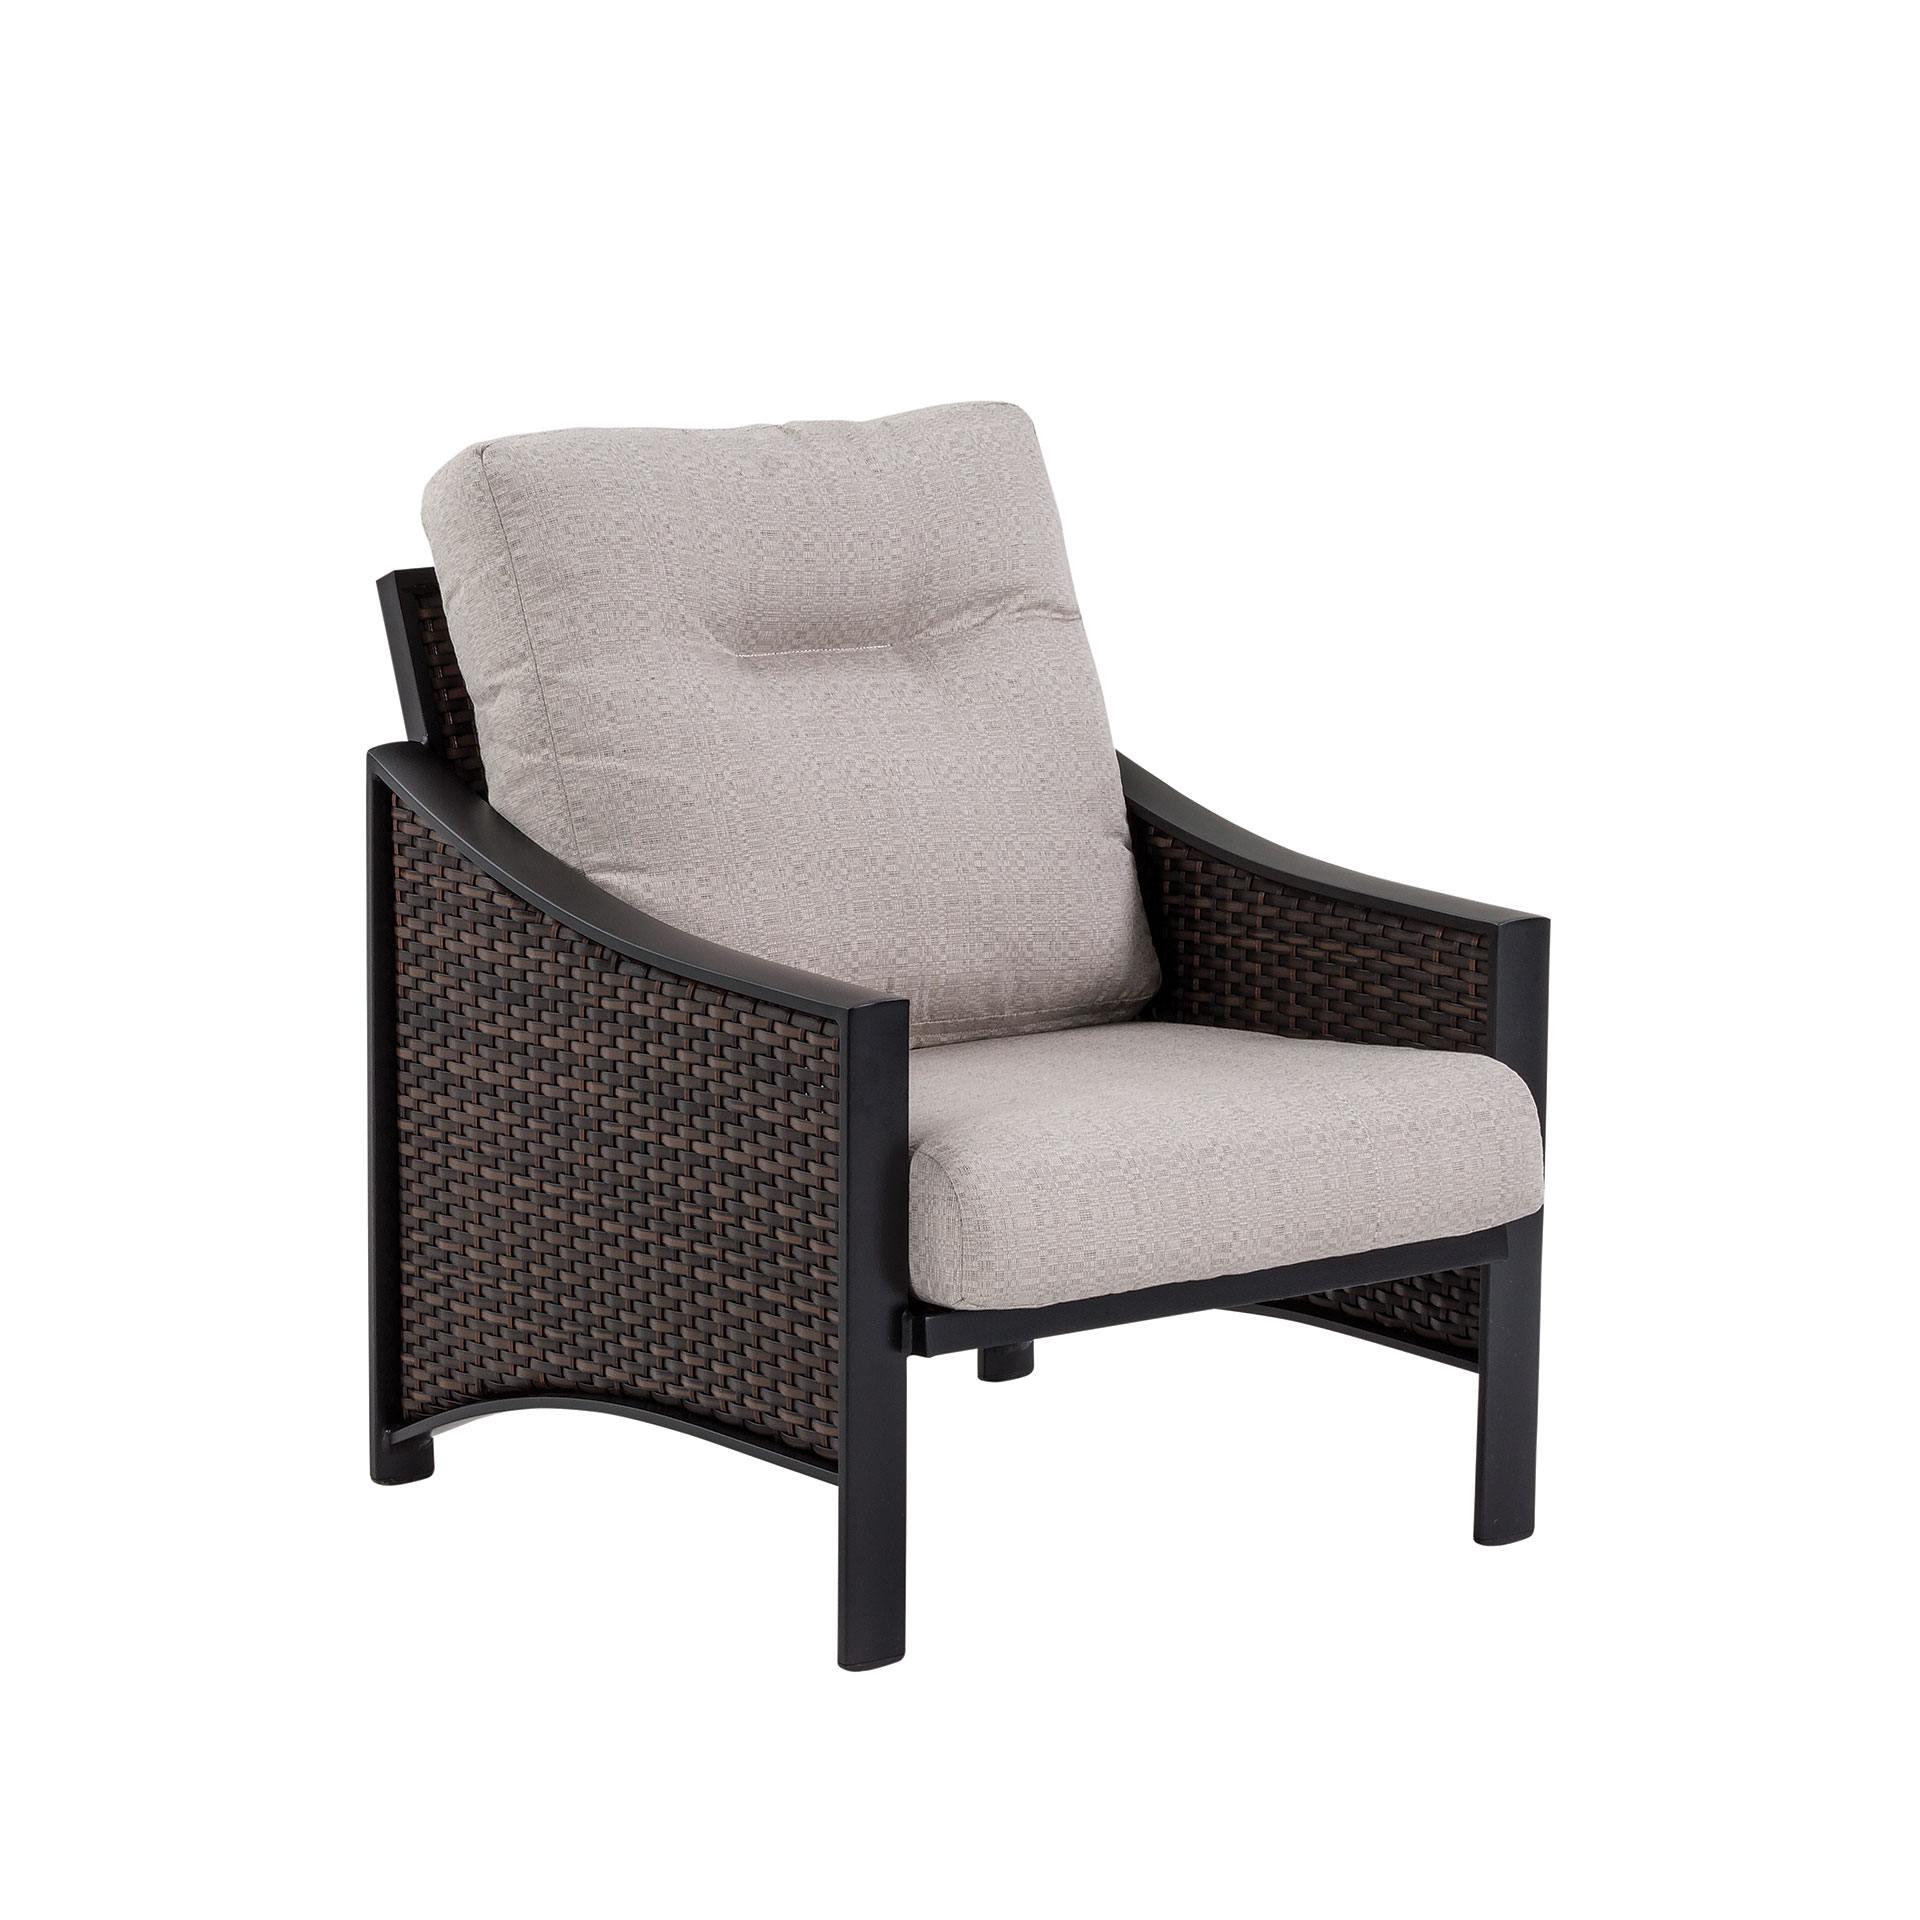 Tropitone Kenzo Woven Lounge Chair Leisure Living